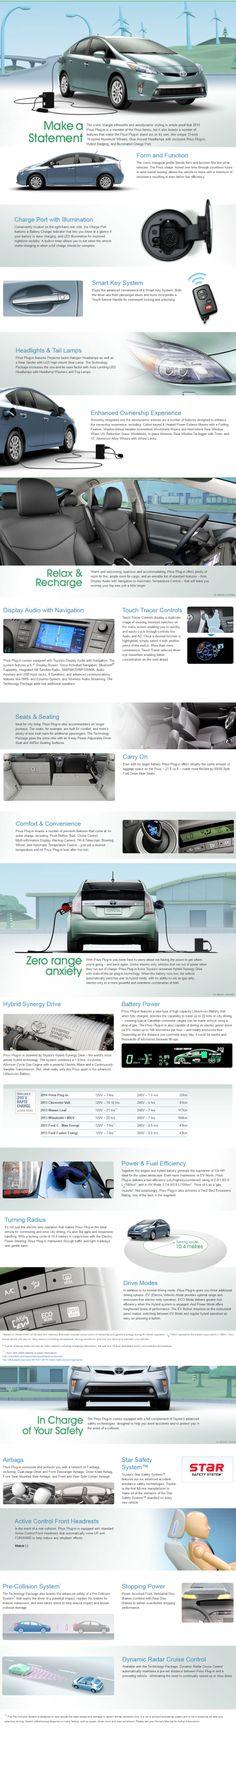 2014 Toyota Prius Plug-in Hybrid Features